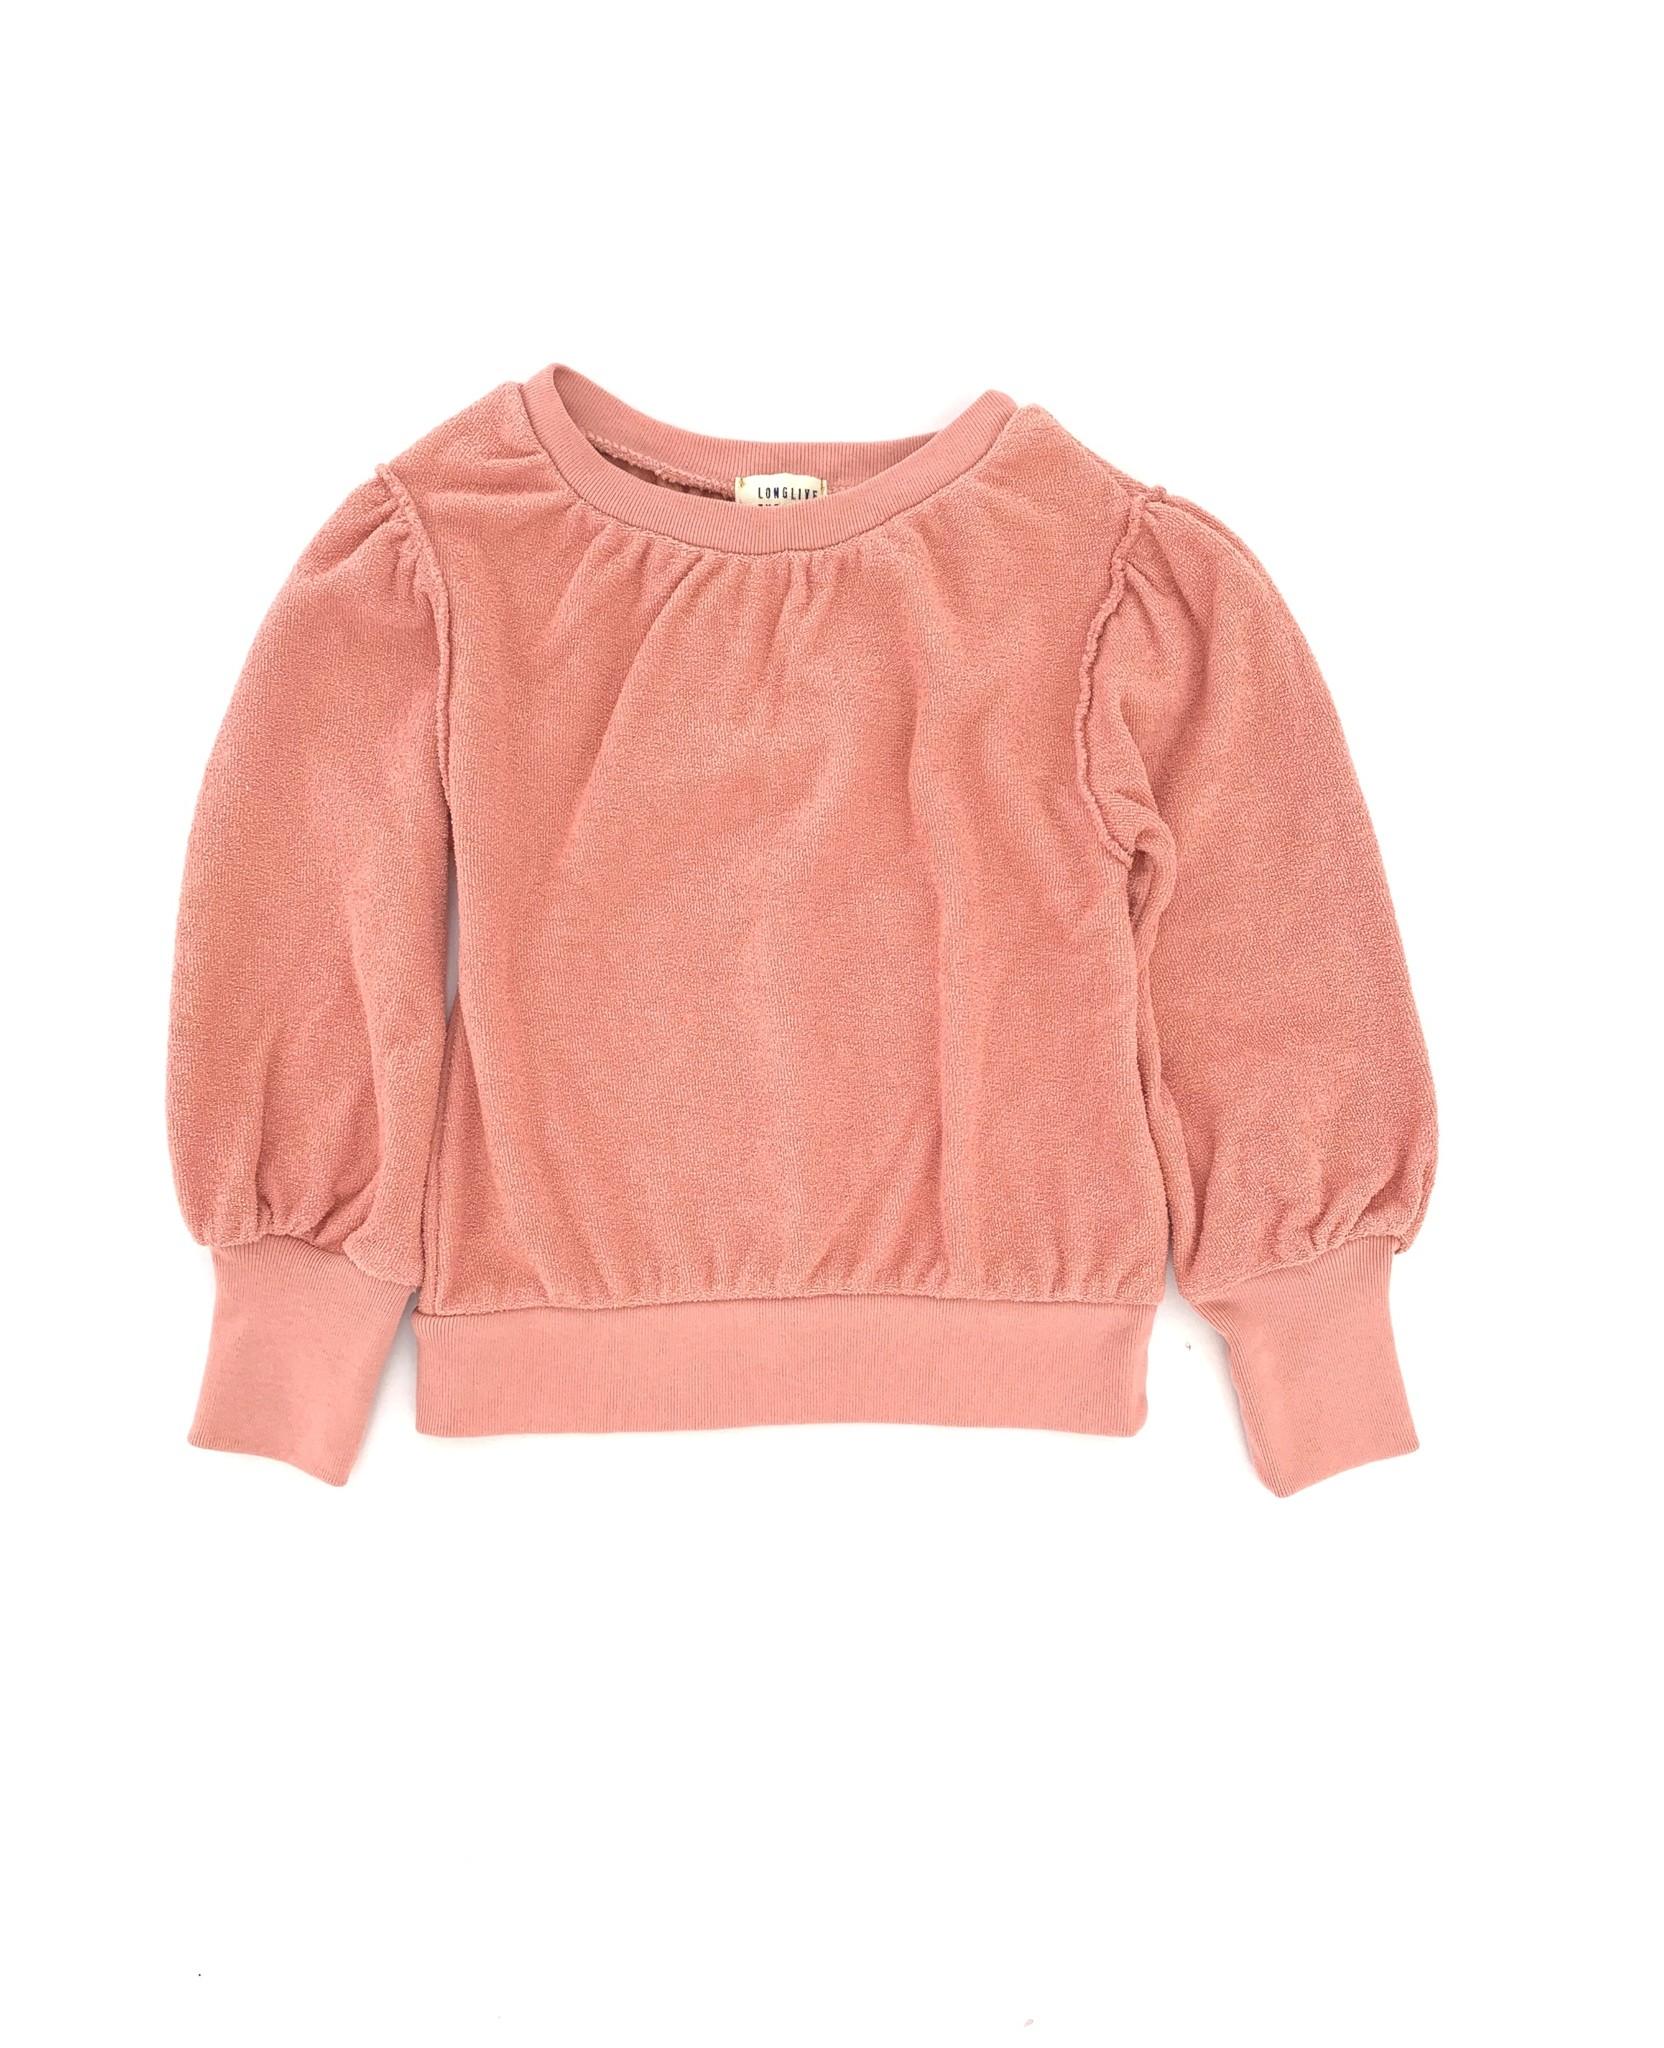 Puffed sweater - Rose-1